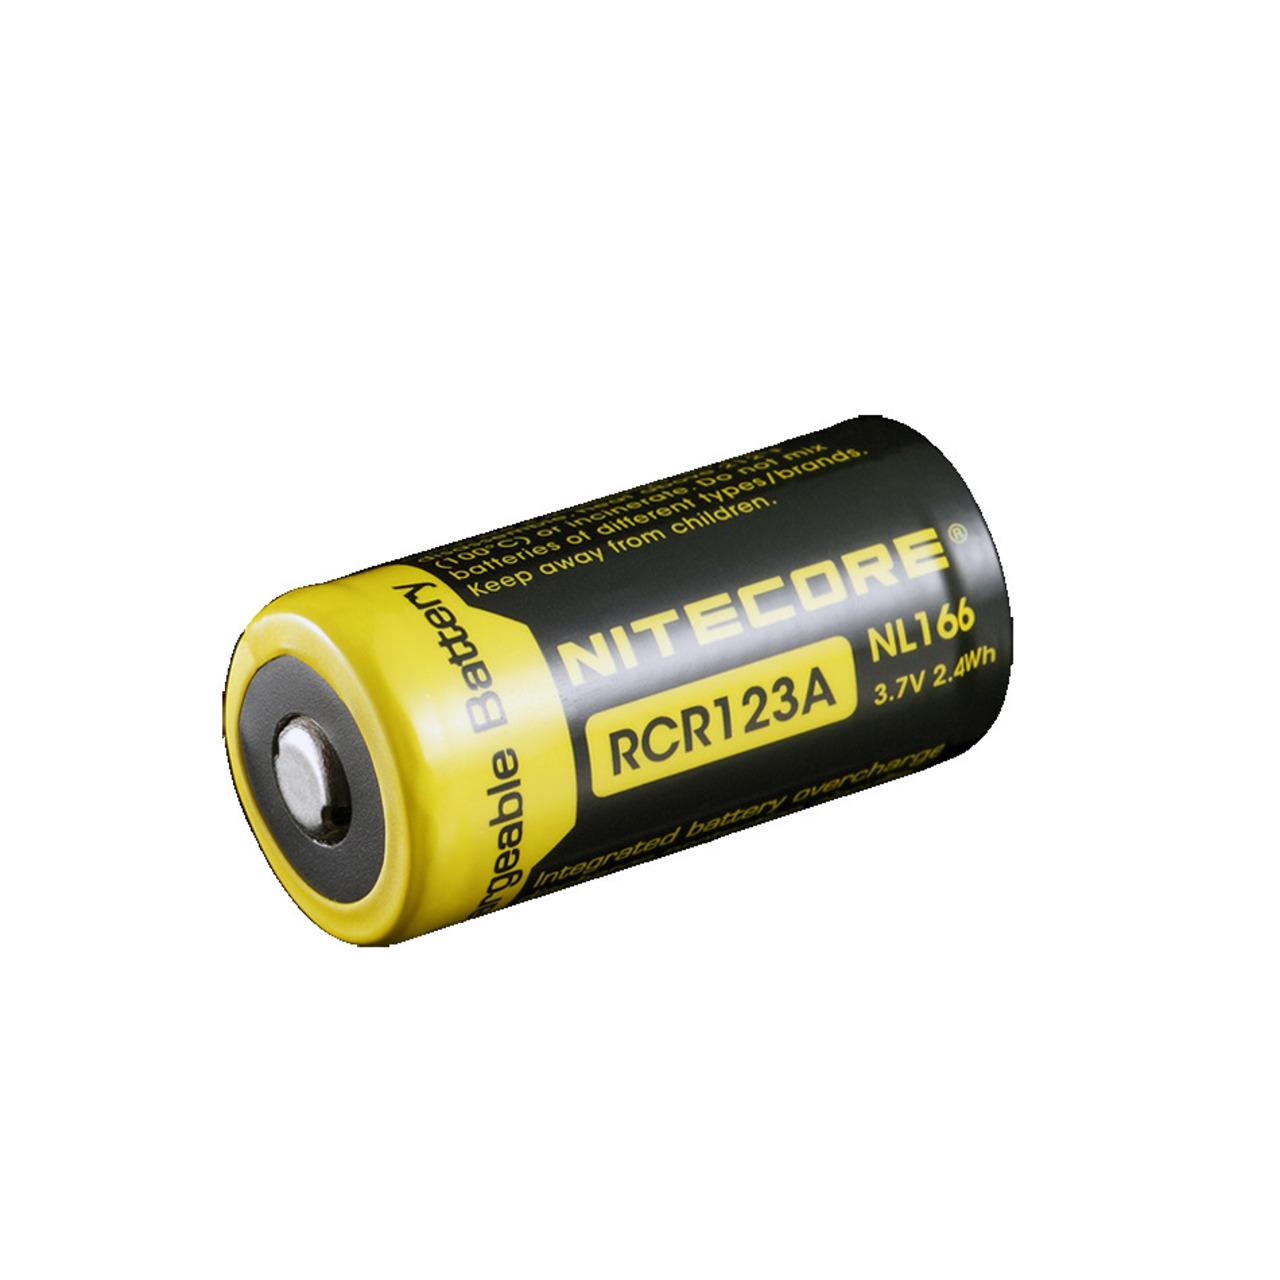 NiteCore Lithium Ion Akku 16340- 650 mAh NL166